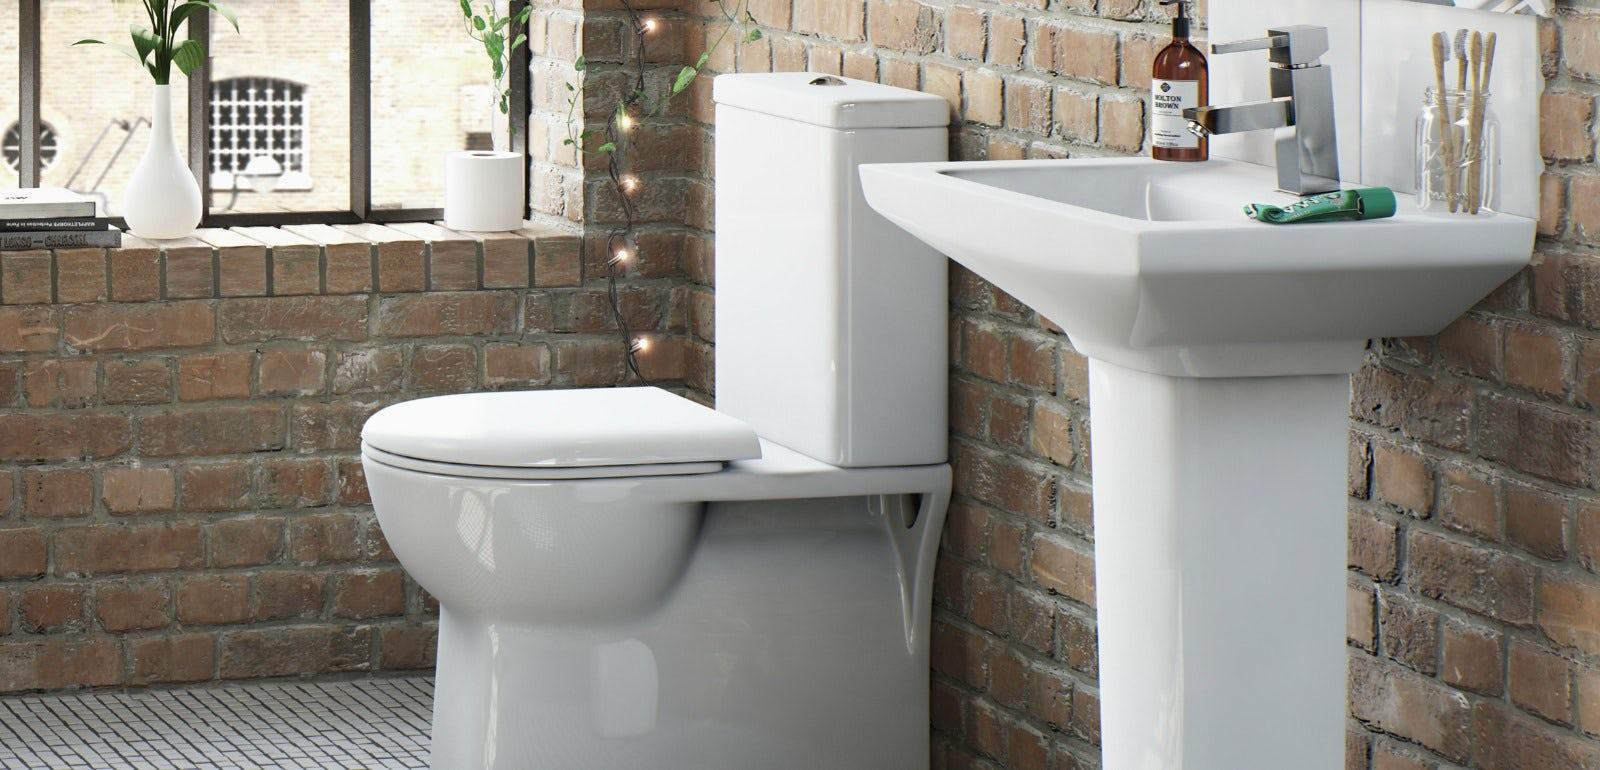 How to create a modern rustic style bathroom